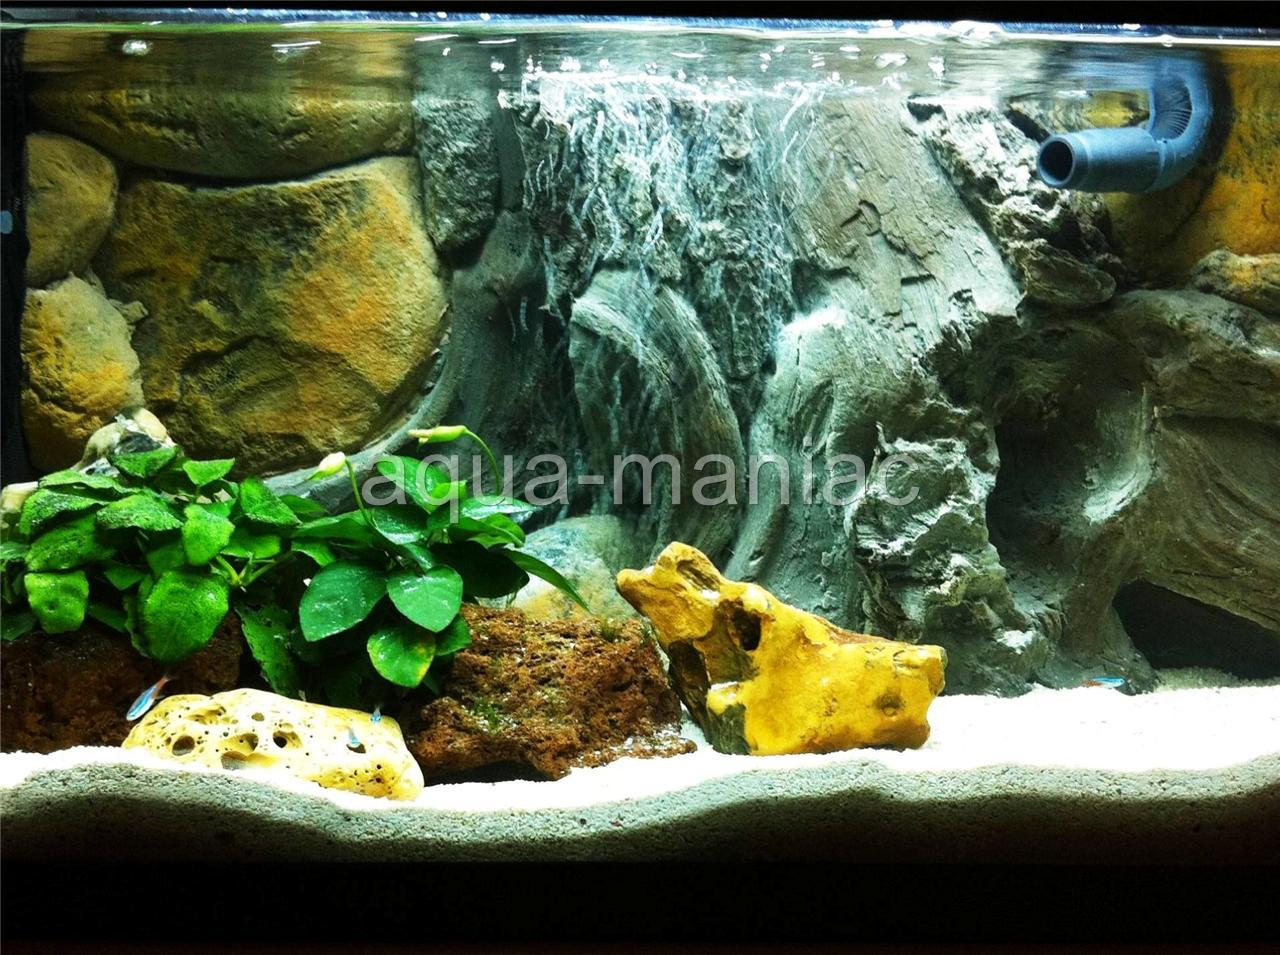 Aquarium backgrounds ebay uk aquarium backgrounds for for 3d fish tank